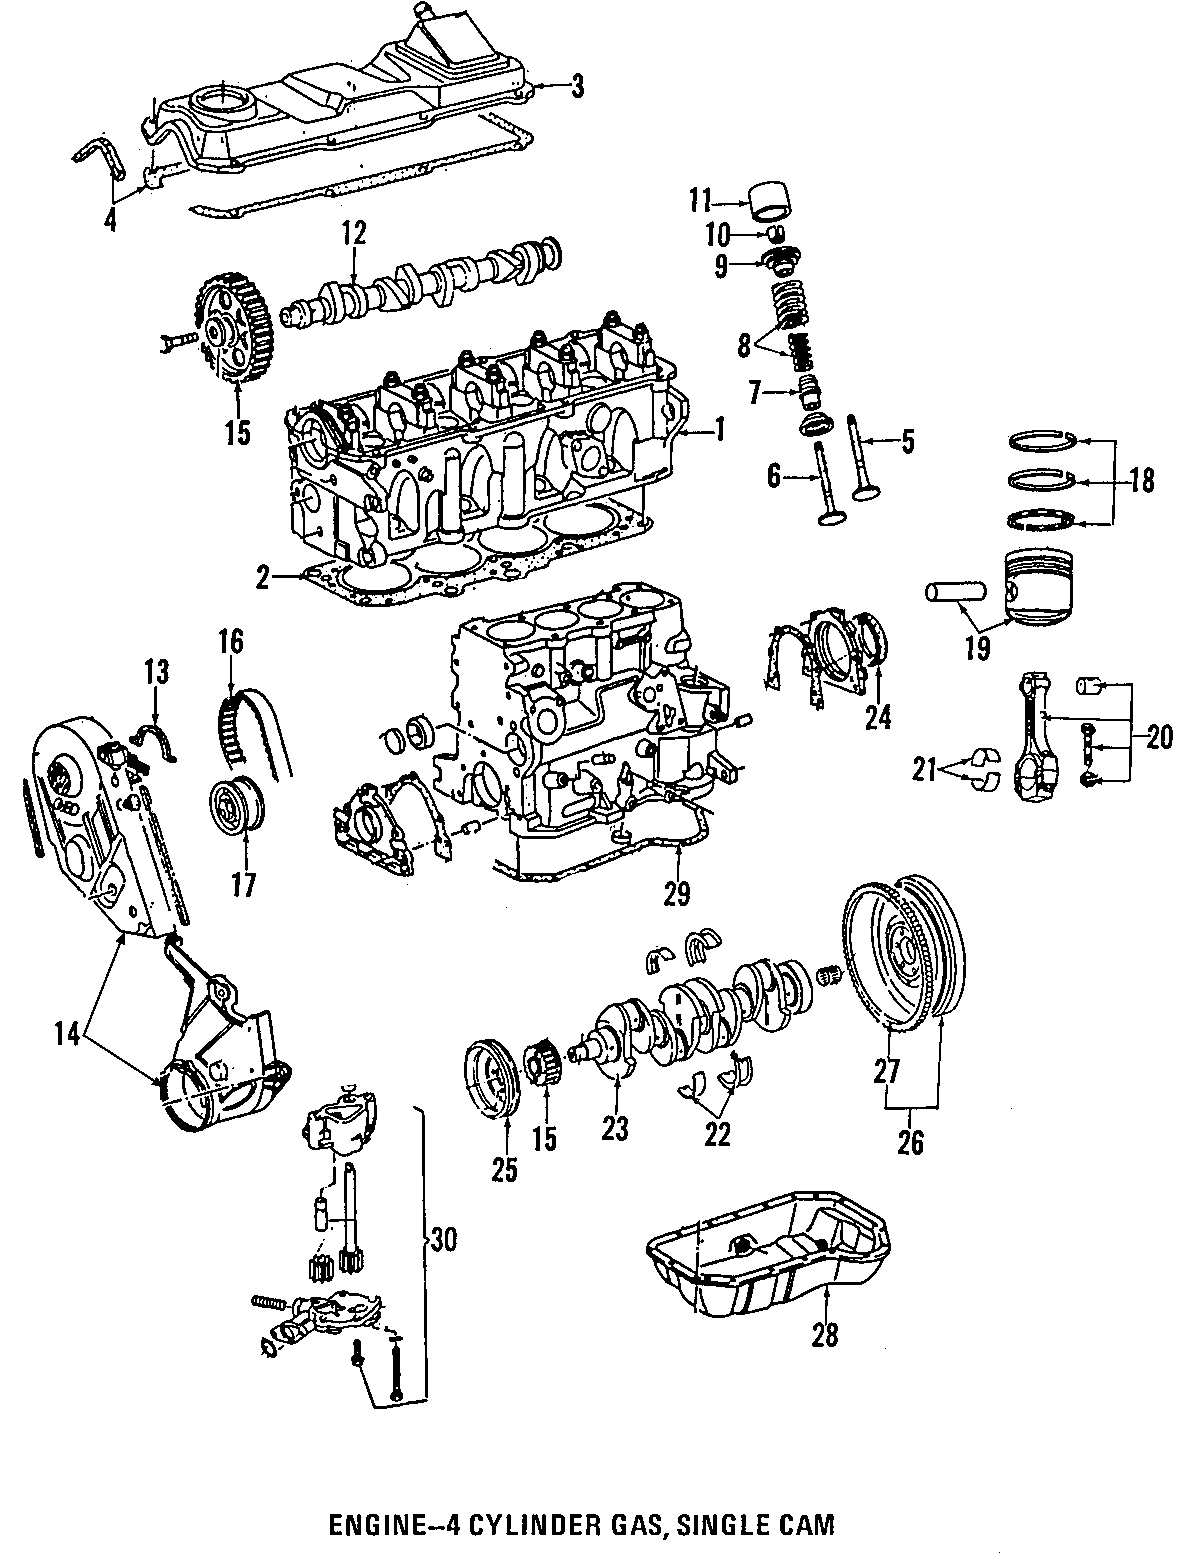 Volkswagen Jetta Engine Valve Cover 2 0 Liter Beetle